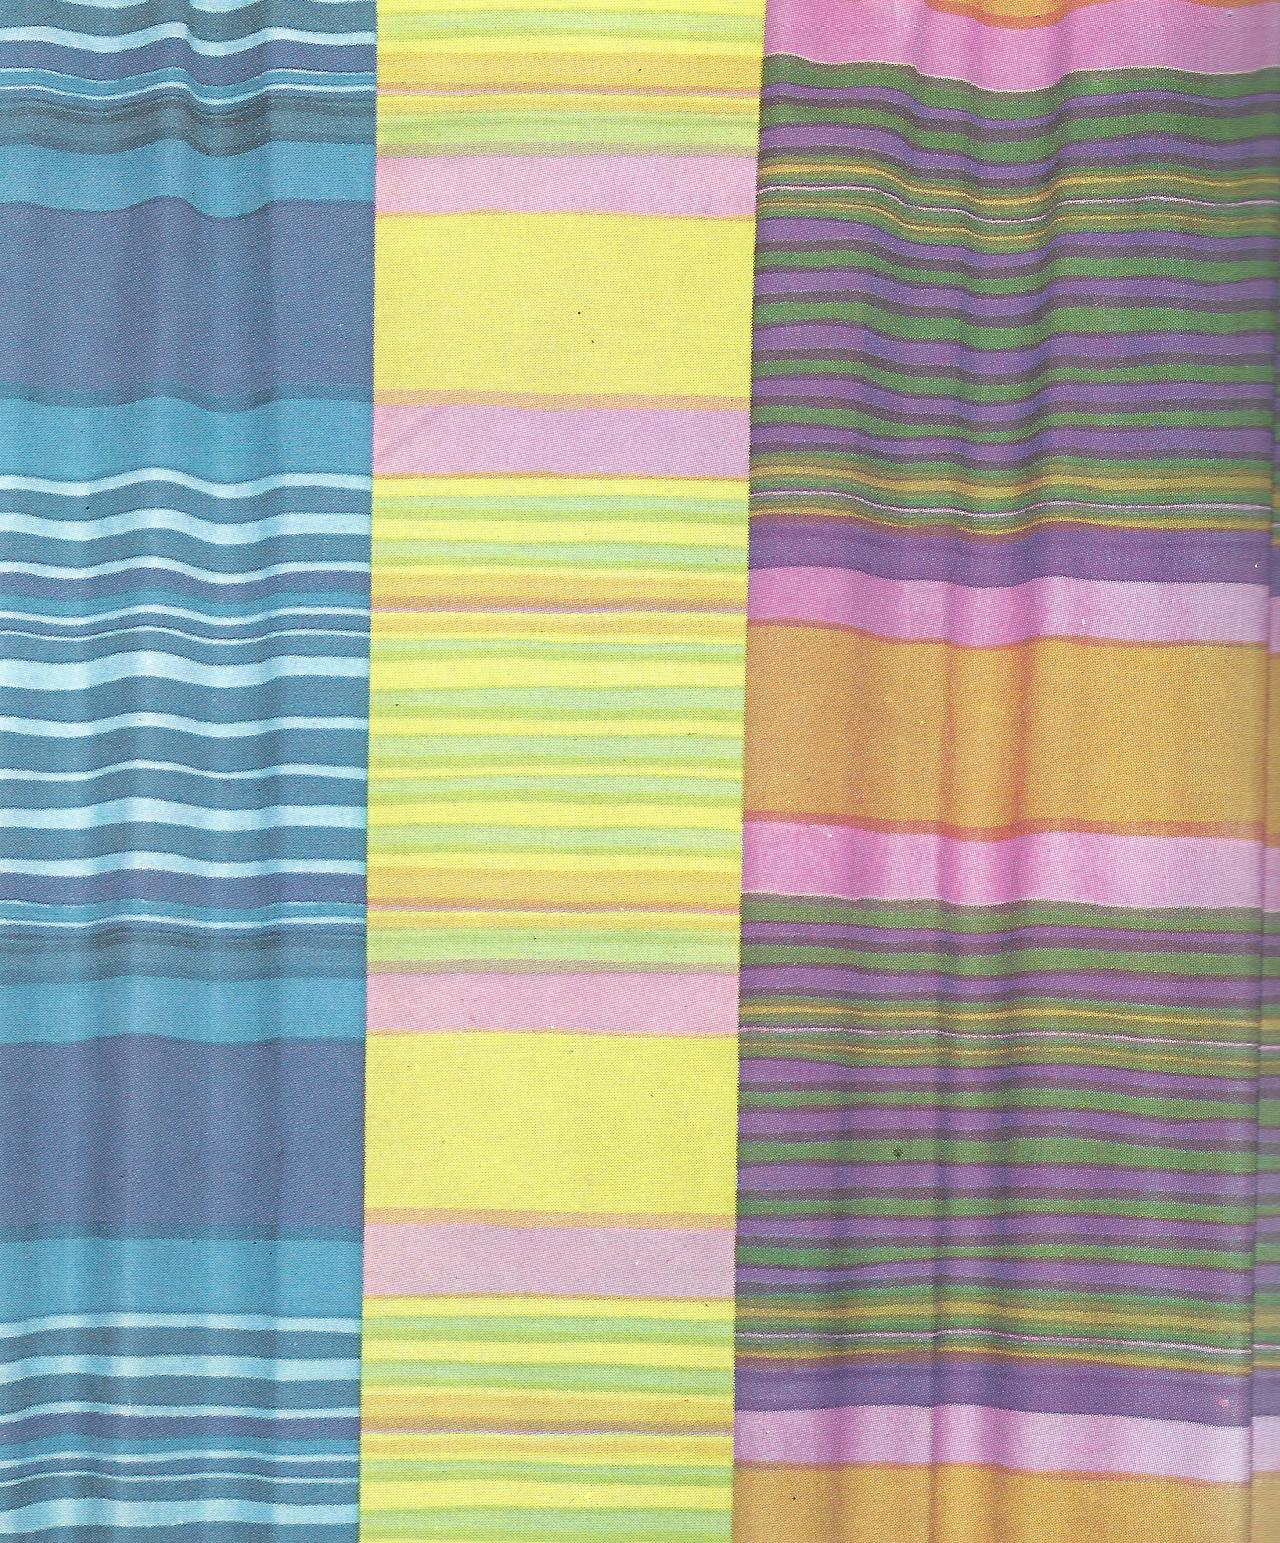 rotti hand printed fabric design vuokko eskolin printex